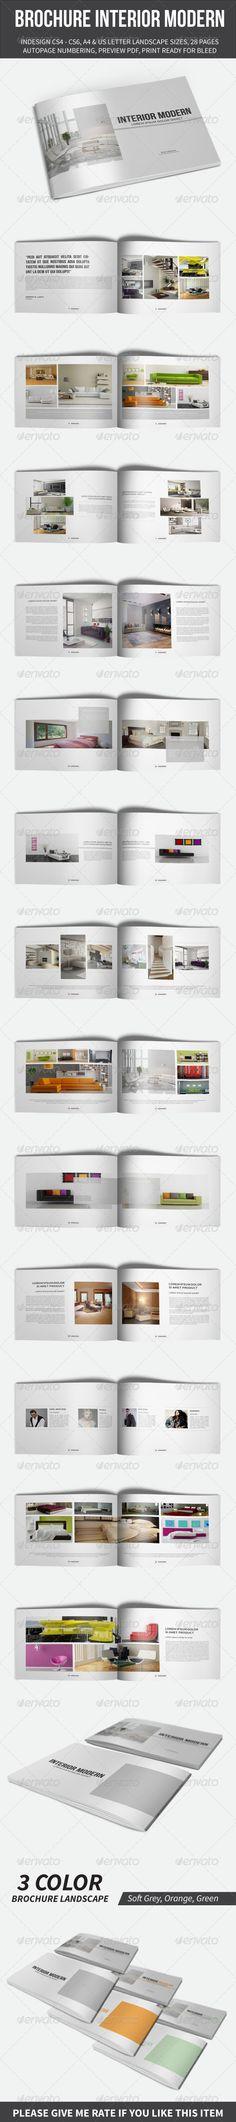 Brochure Interior Modern Template